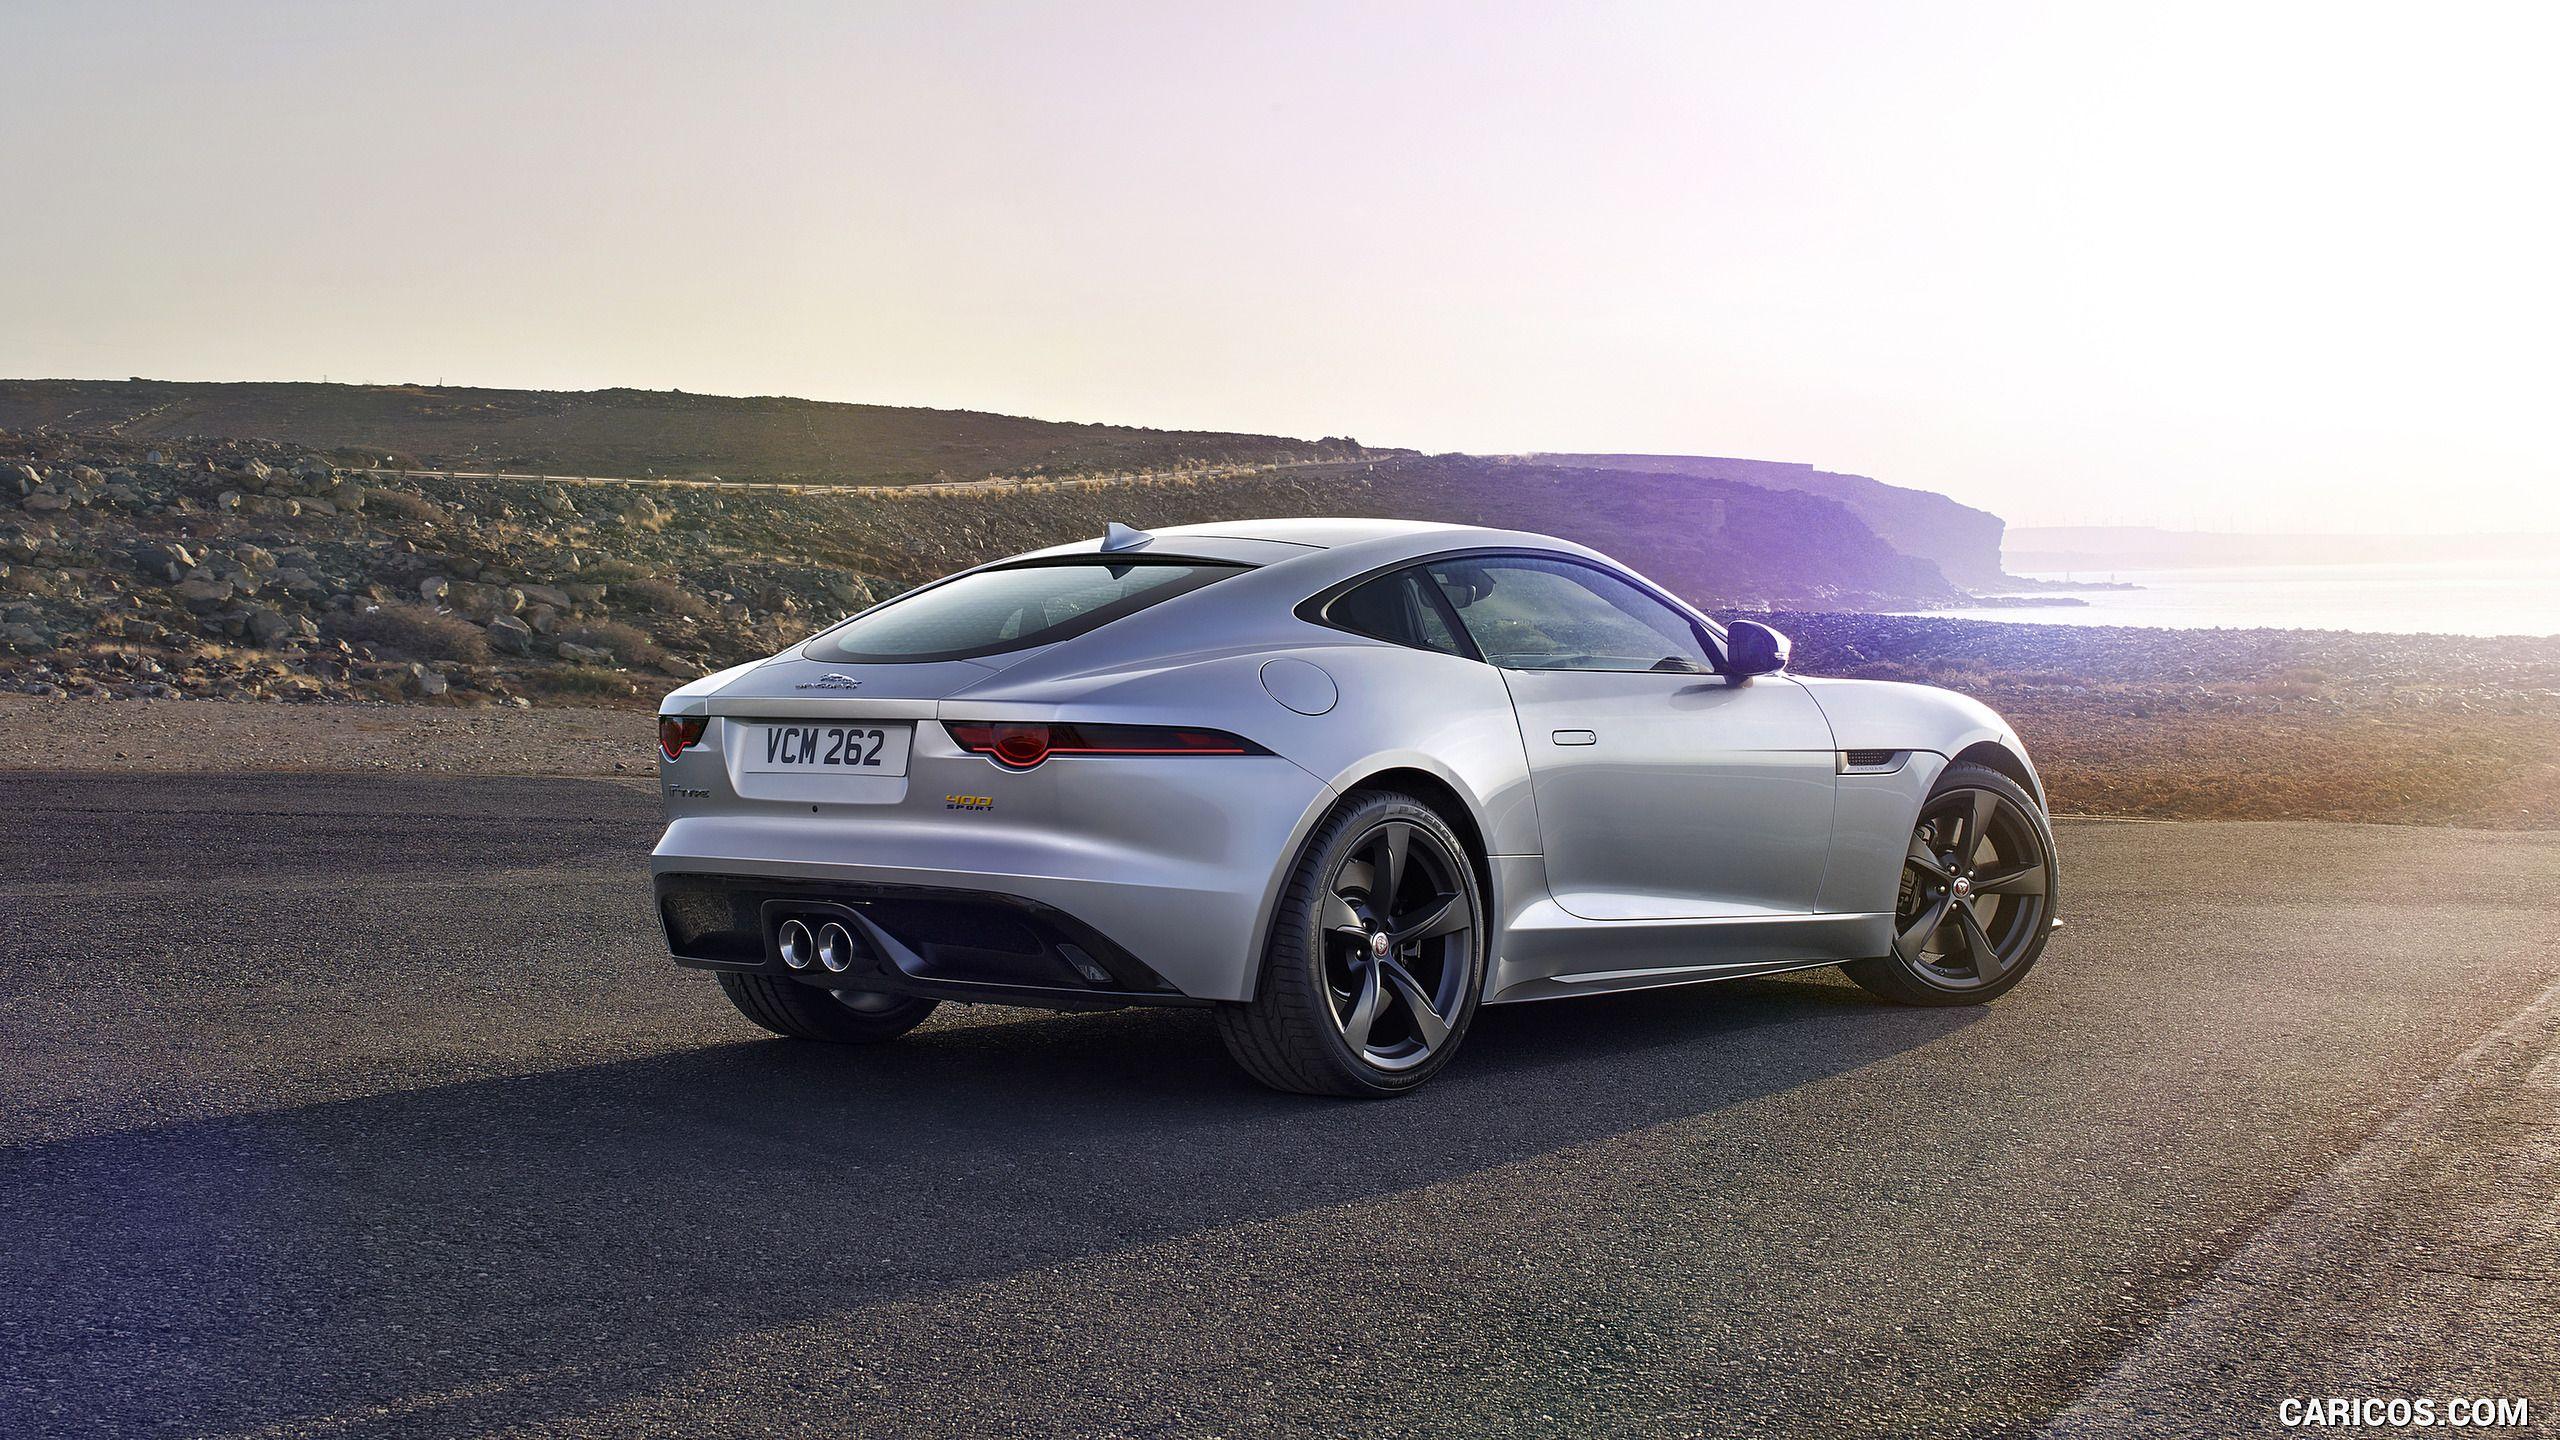 2018 Jaguar F Type Coupe And Convertible Wallpaper Dream Big